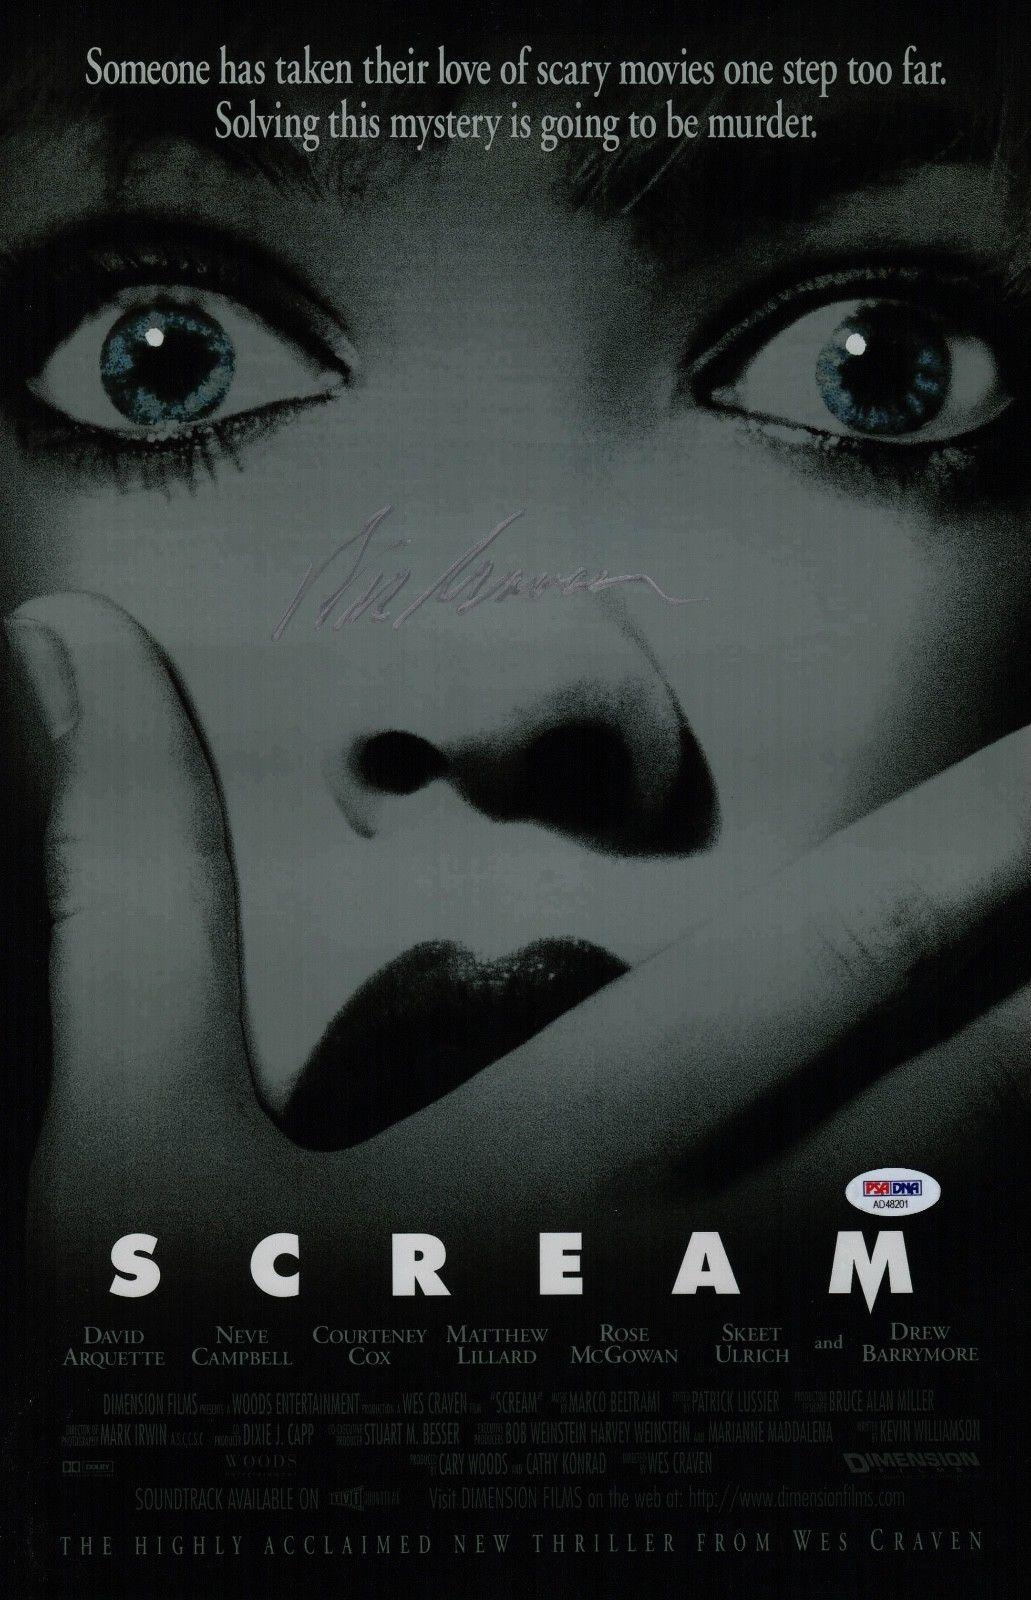 Wes Craven Signed Scream 11x17 Movie Poster Psa Coa Ad48201